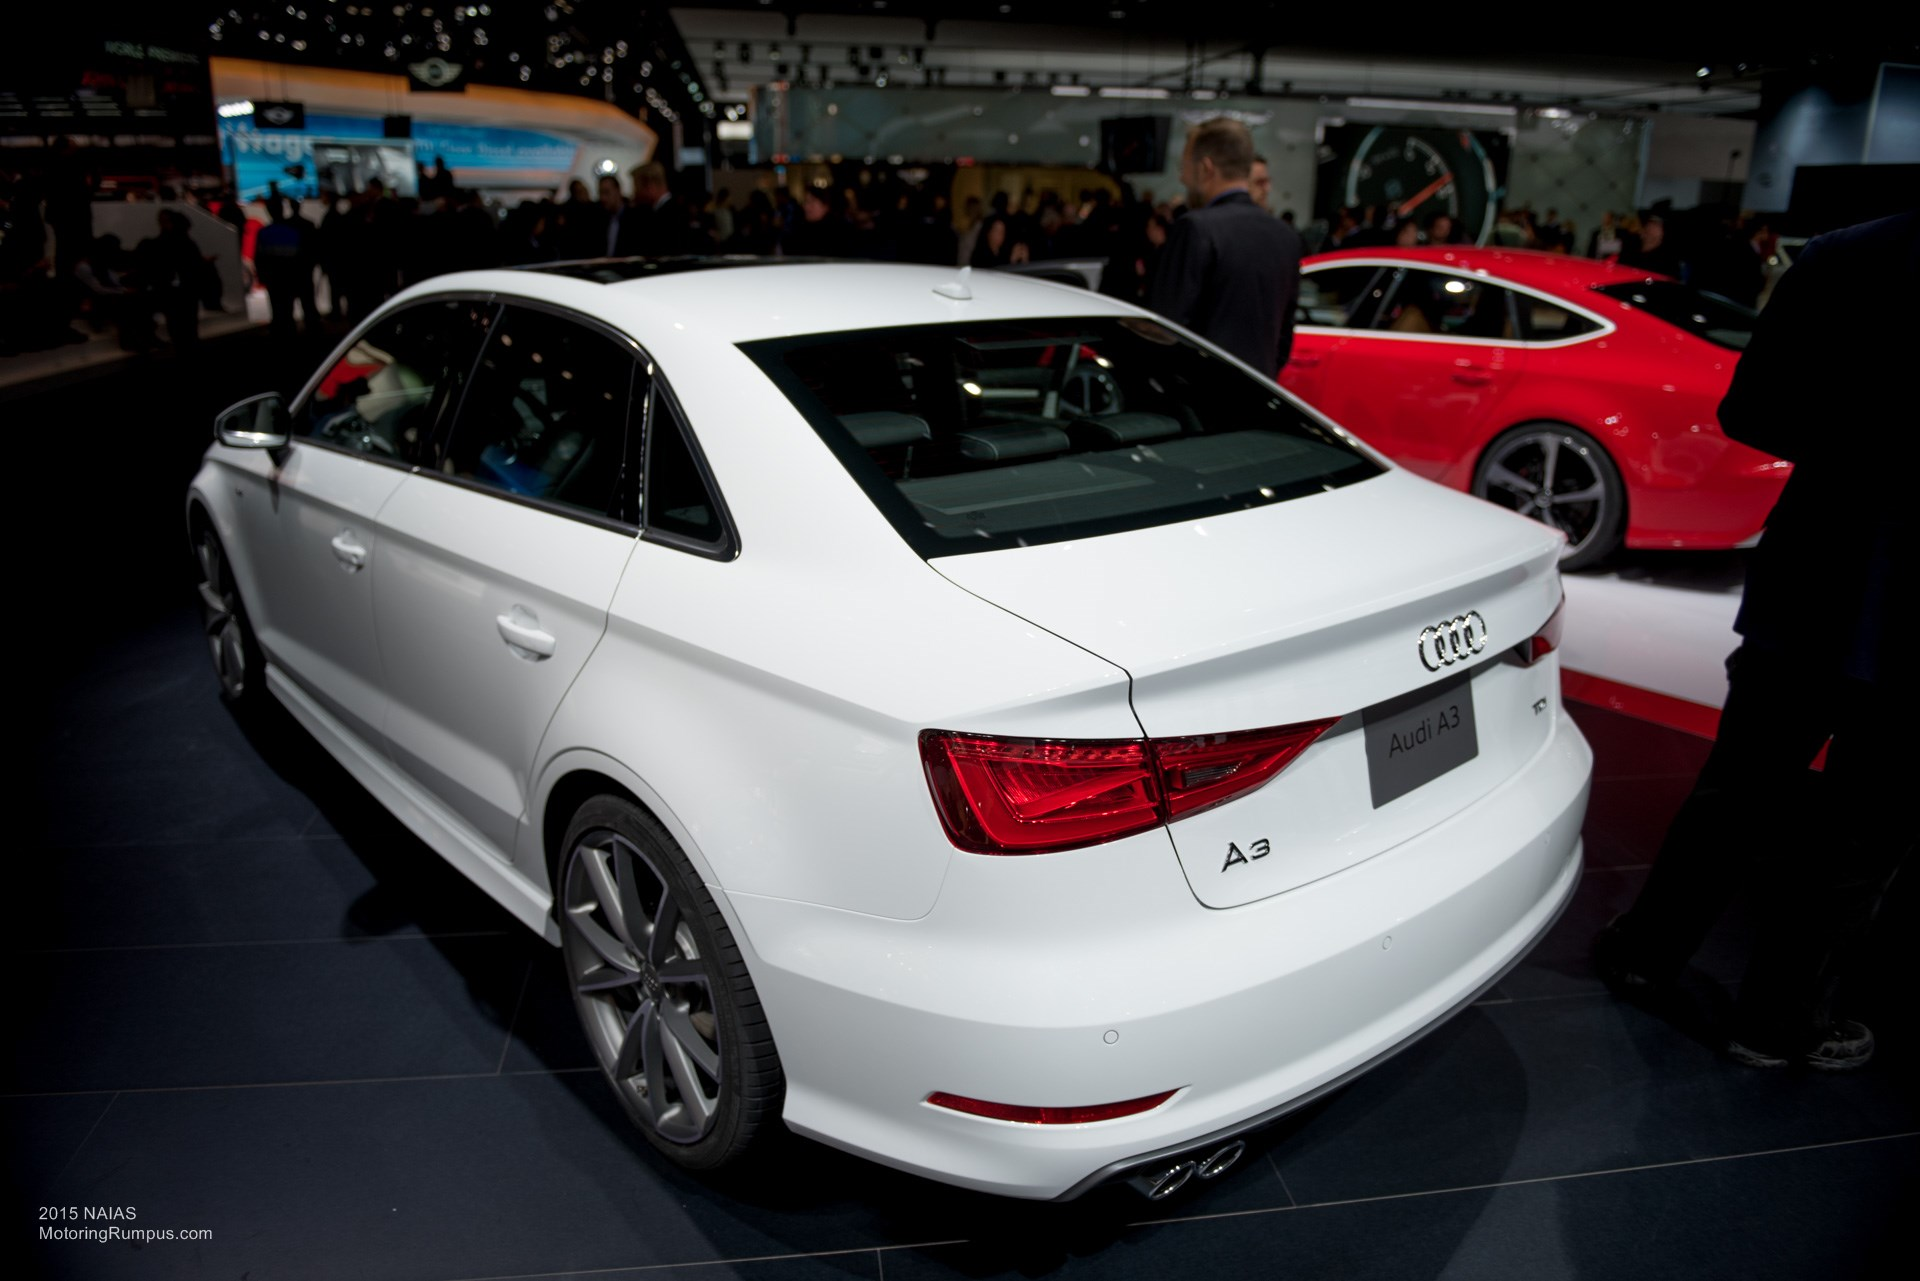 2015 NAIAS Audi A3 Rear